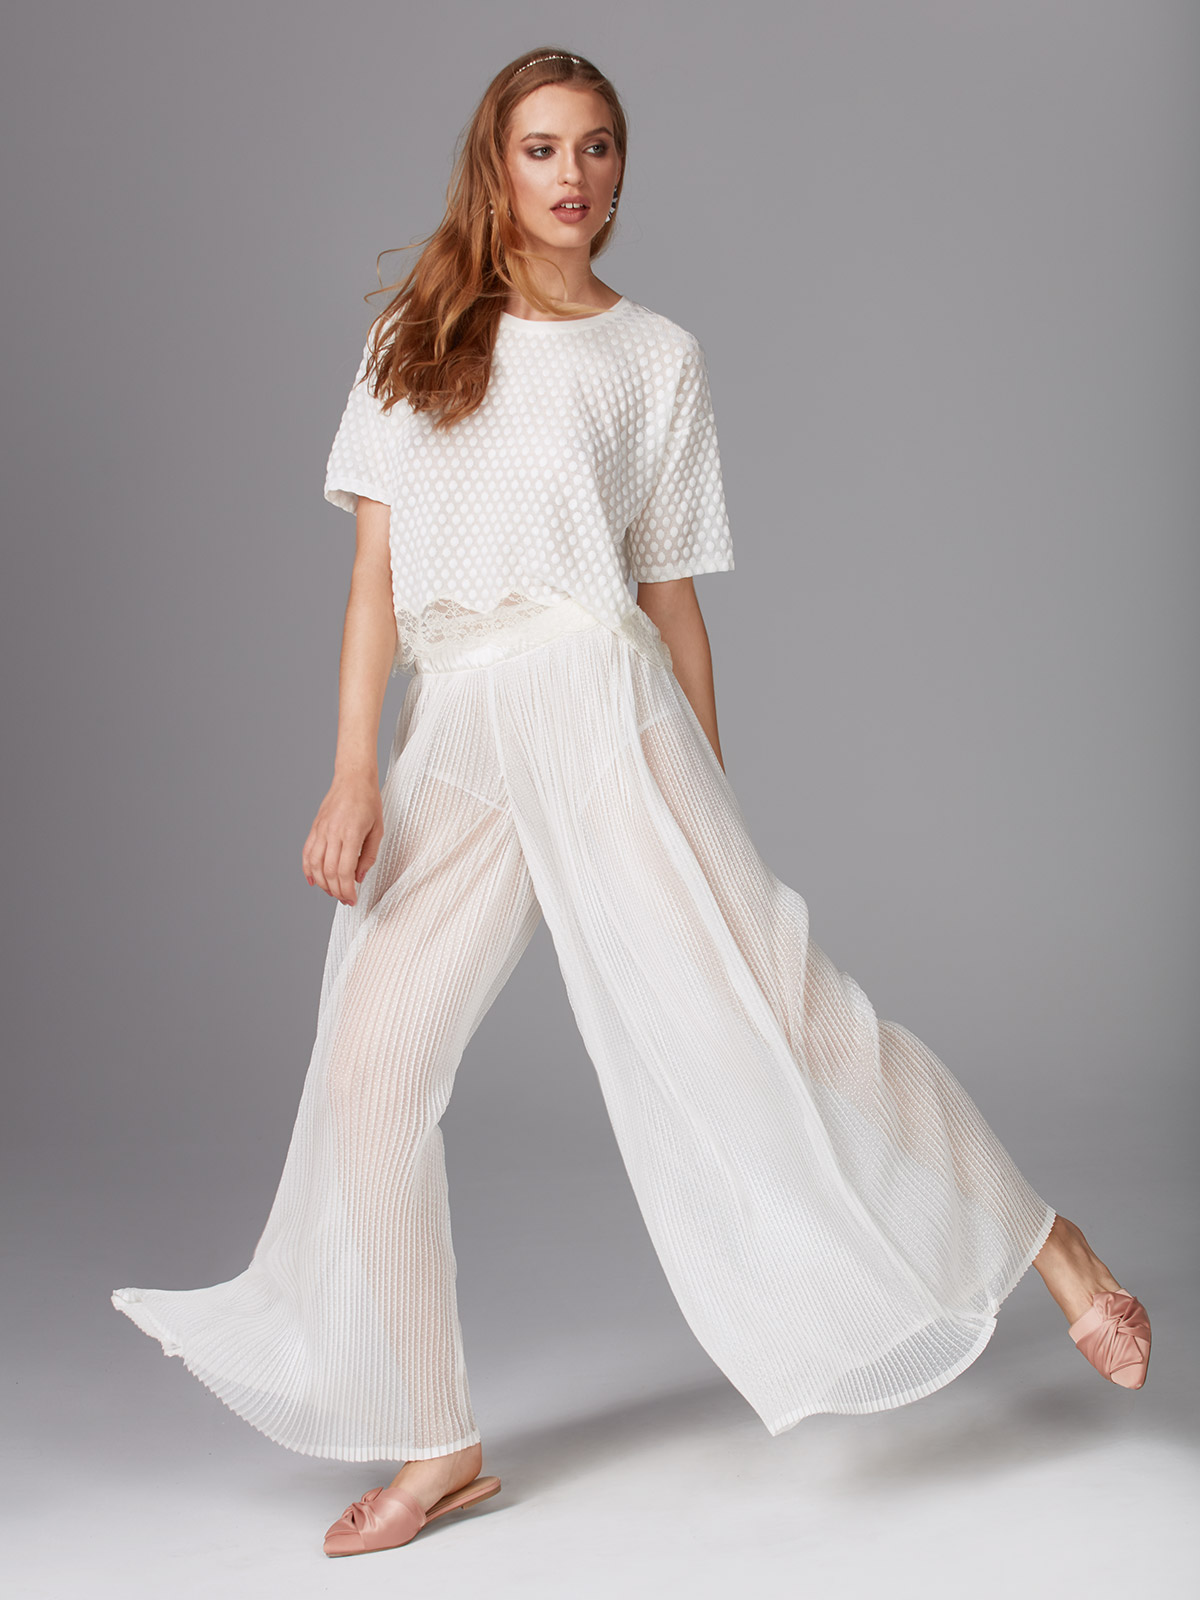 Florence OZ025 Maglia<br />Dance In The Rain OZ026 Pantalone Palazzo<br />01 Ivory, 02 Black